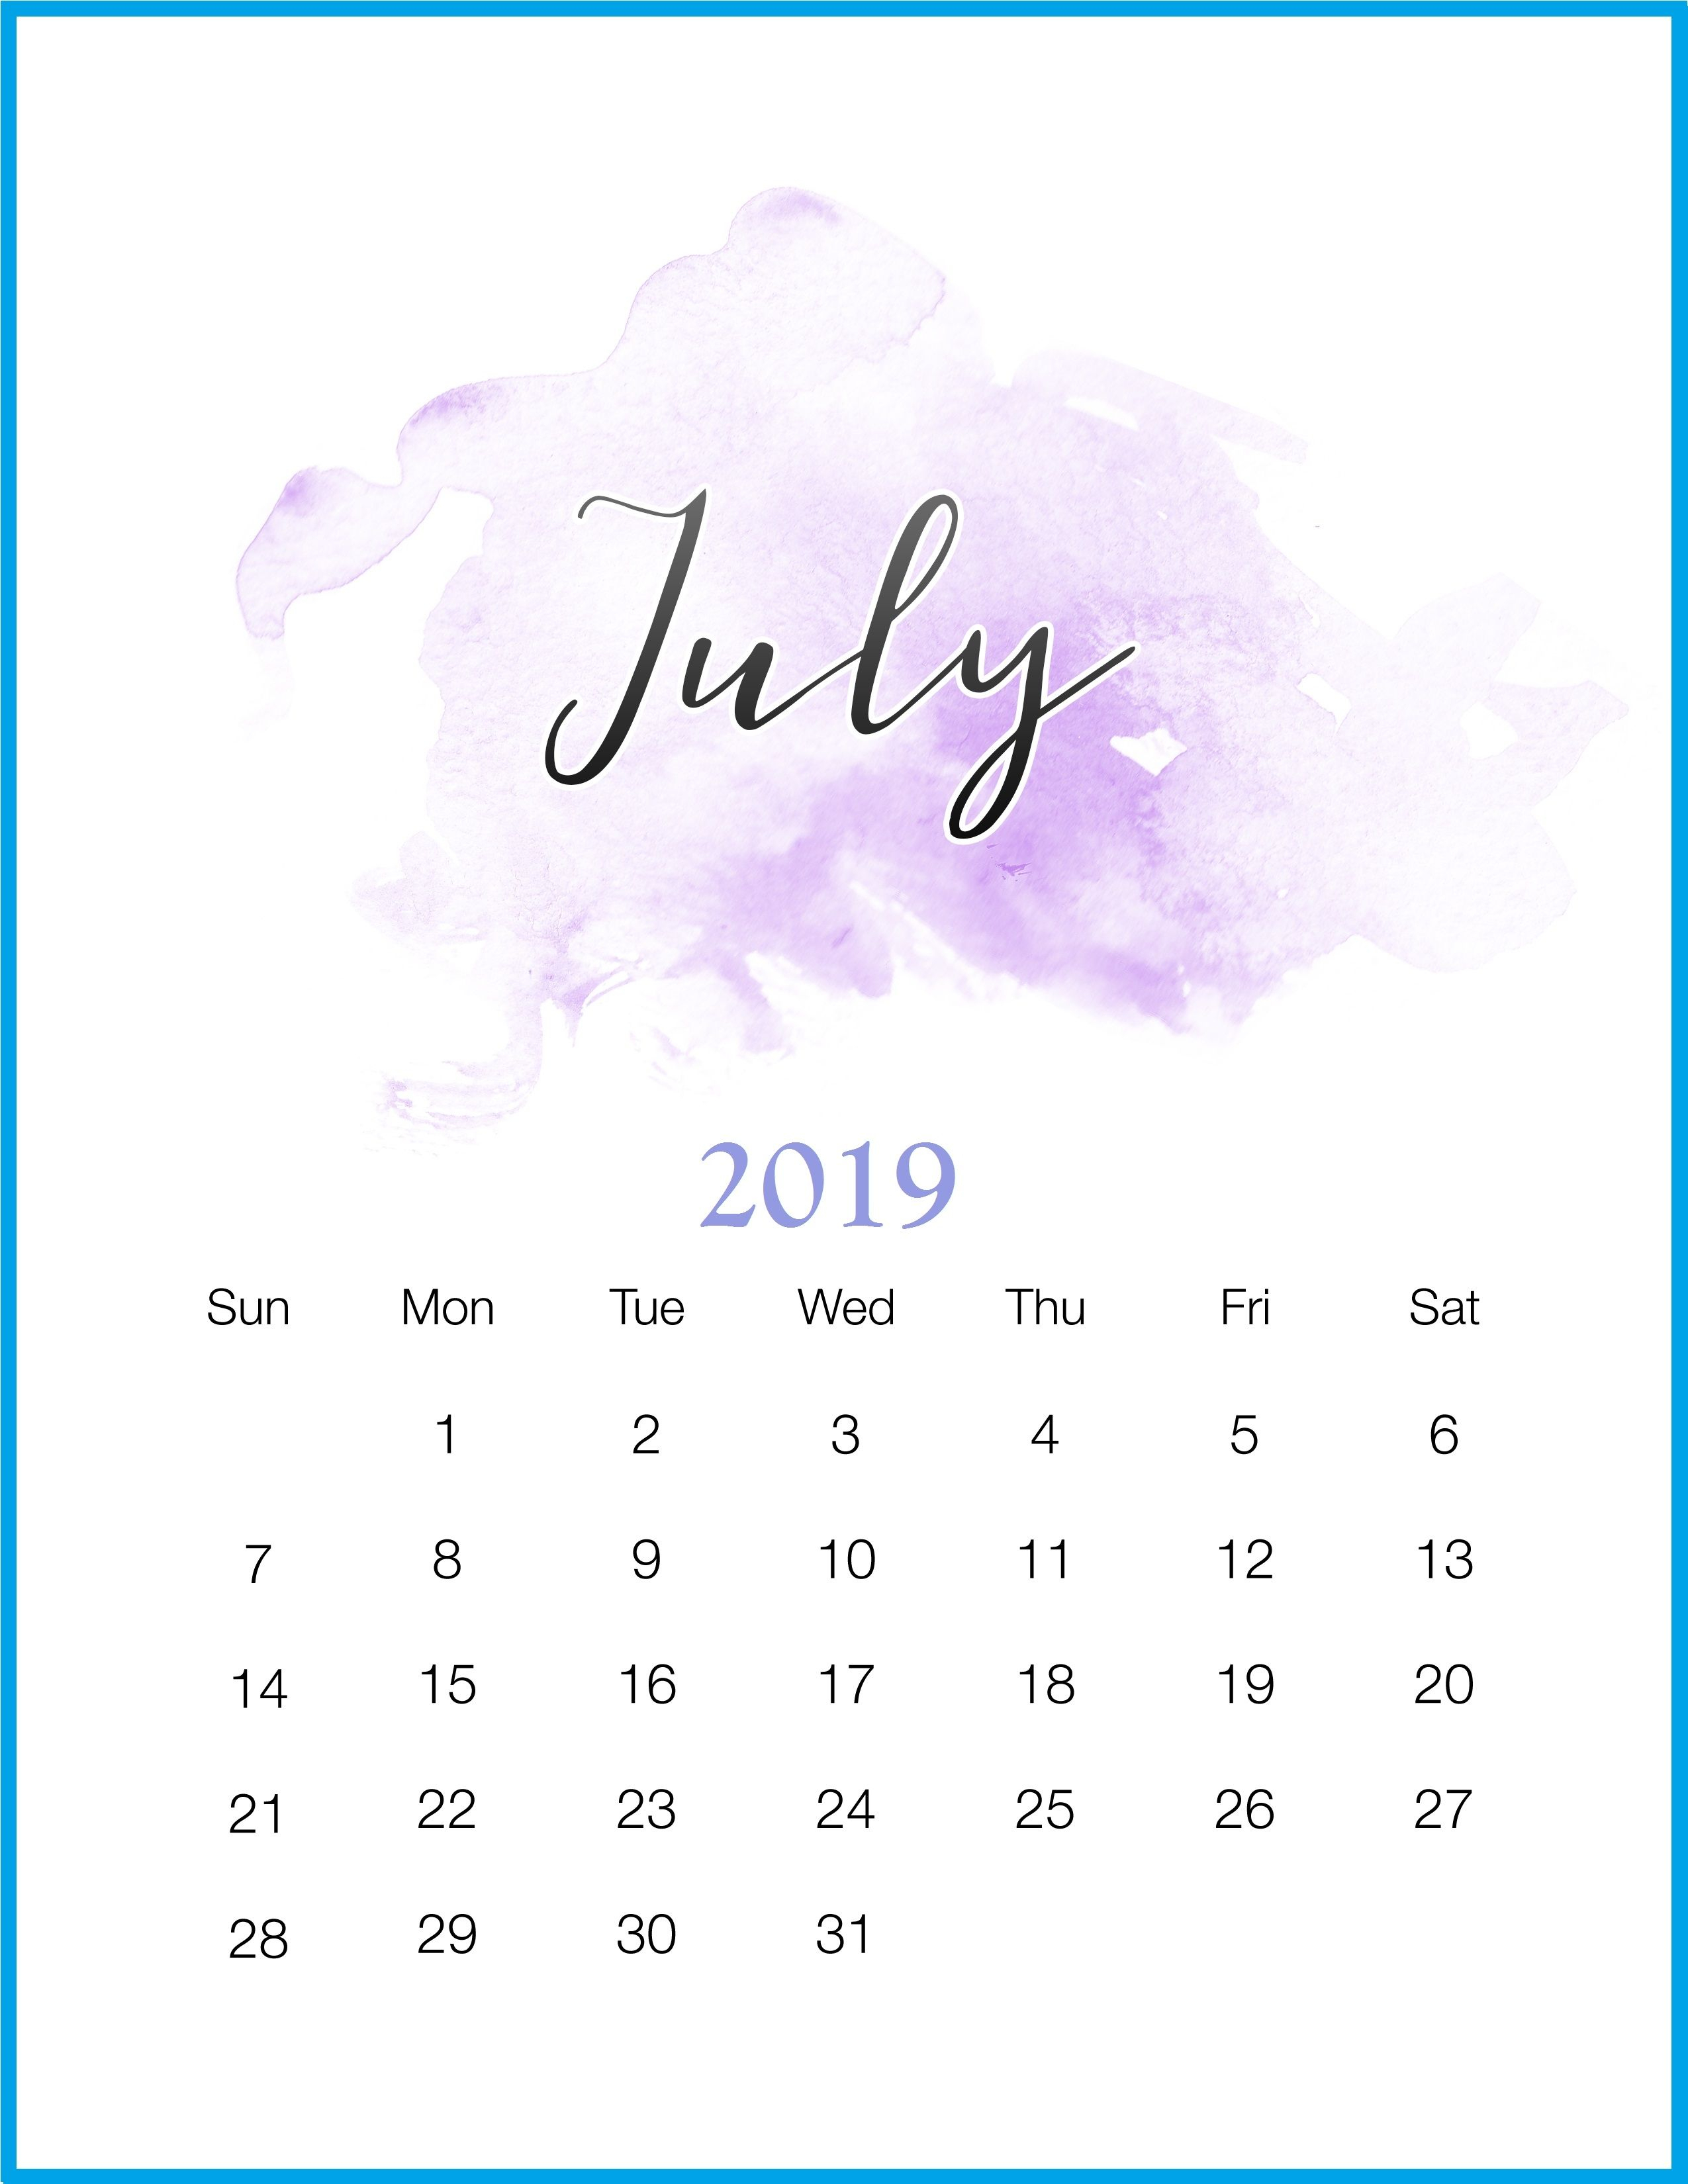 Get Free July 2019 Calendar Template Decemberjuly 2019 regarding Script Calendario Photoshop